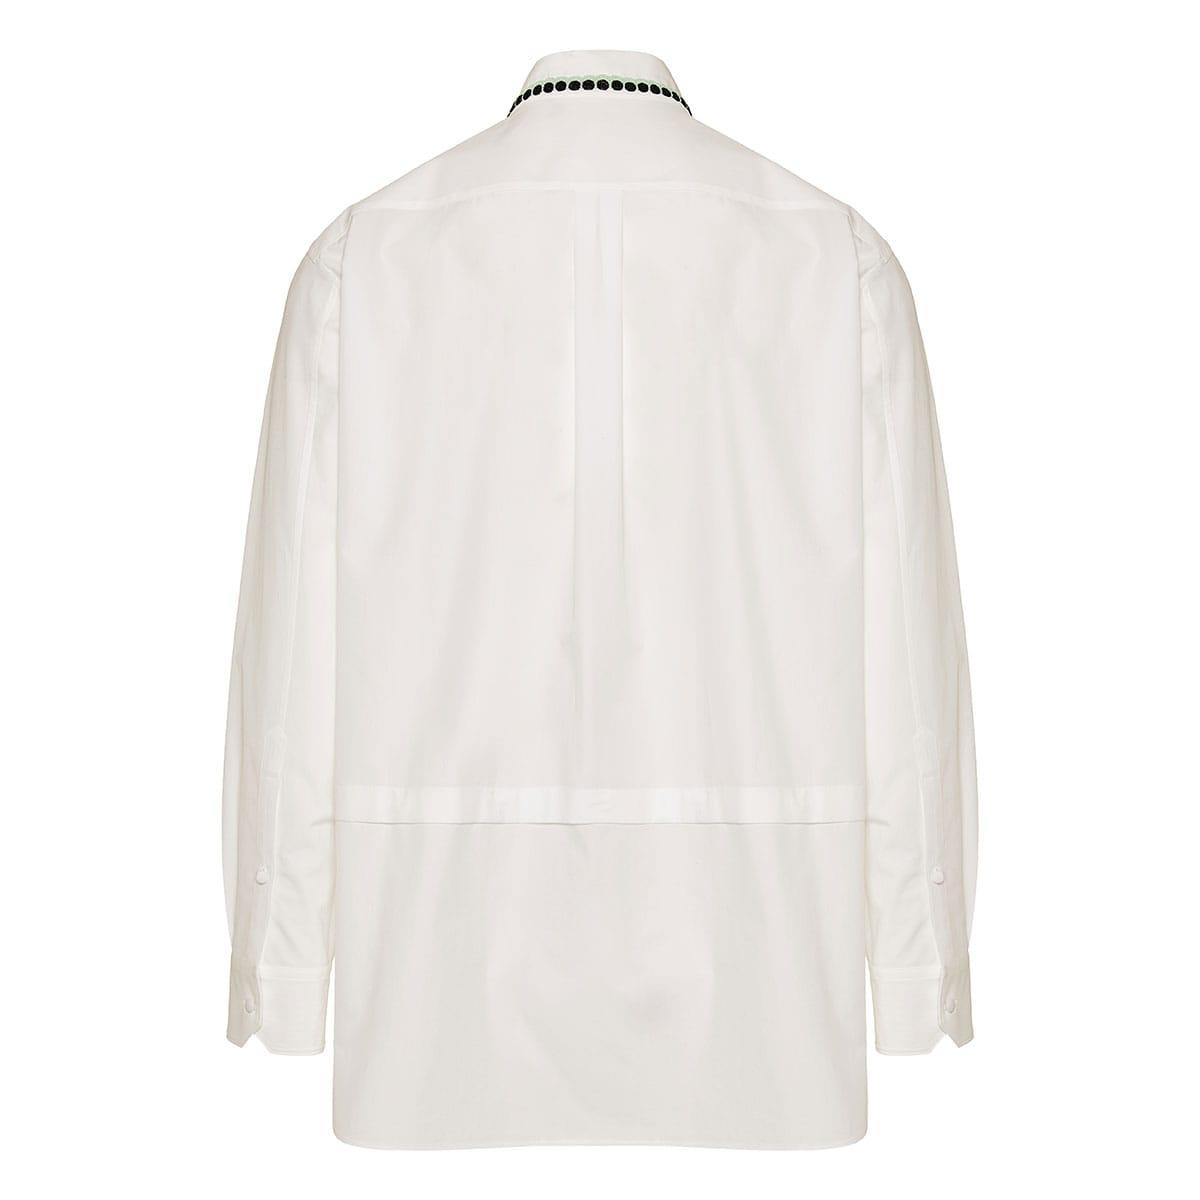 Bead-embellished oversized poplin shirt